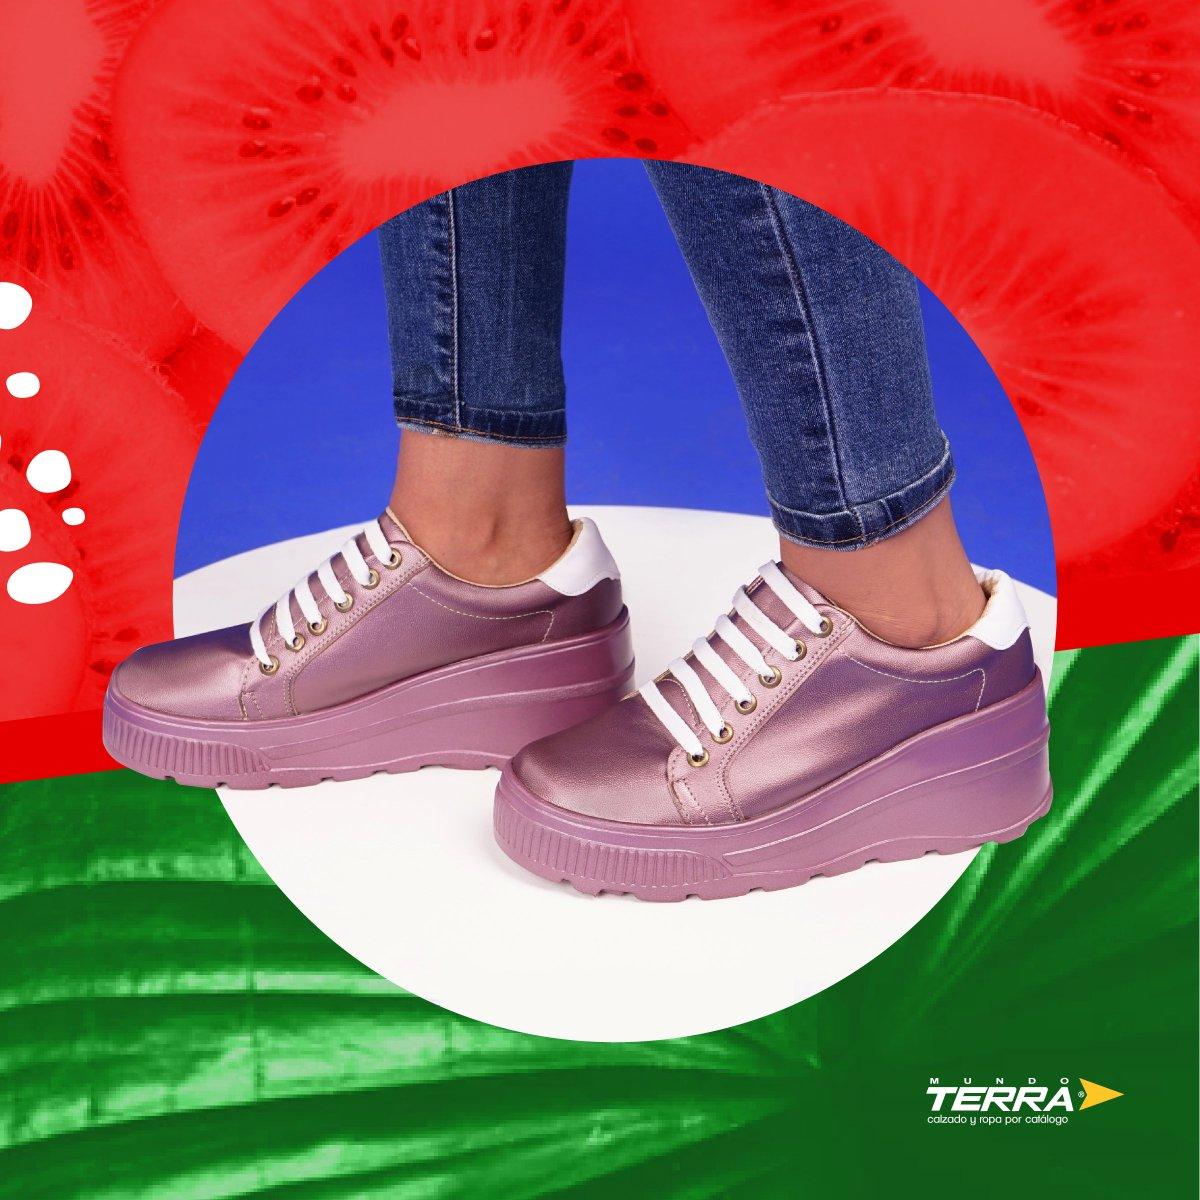 Dale tu estilo a cada paso.  #mundoterra #shoes #loveshoes #look #outfit #primavera #loveit #ropa #zapatos #fashion #moda https://t.co/RhvFi1heE0